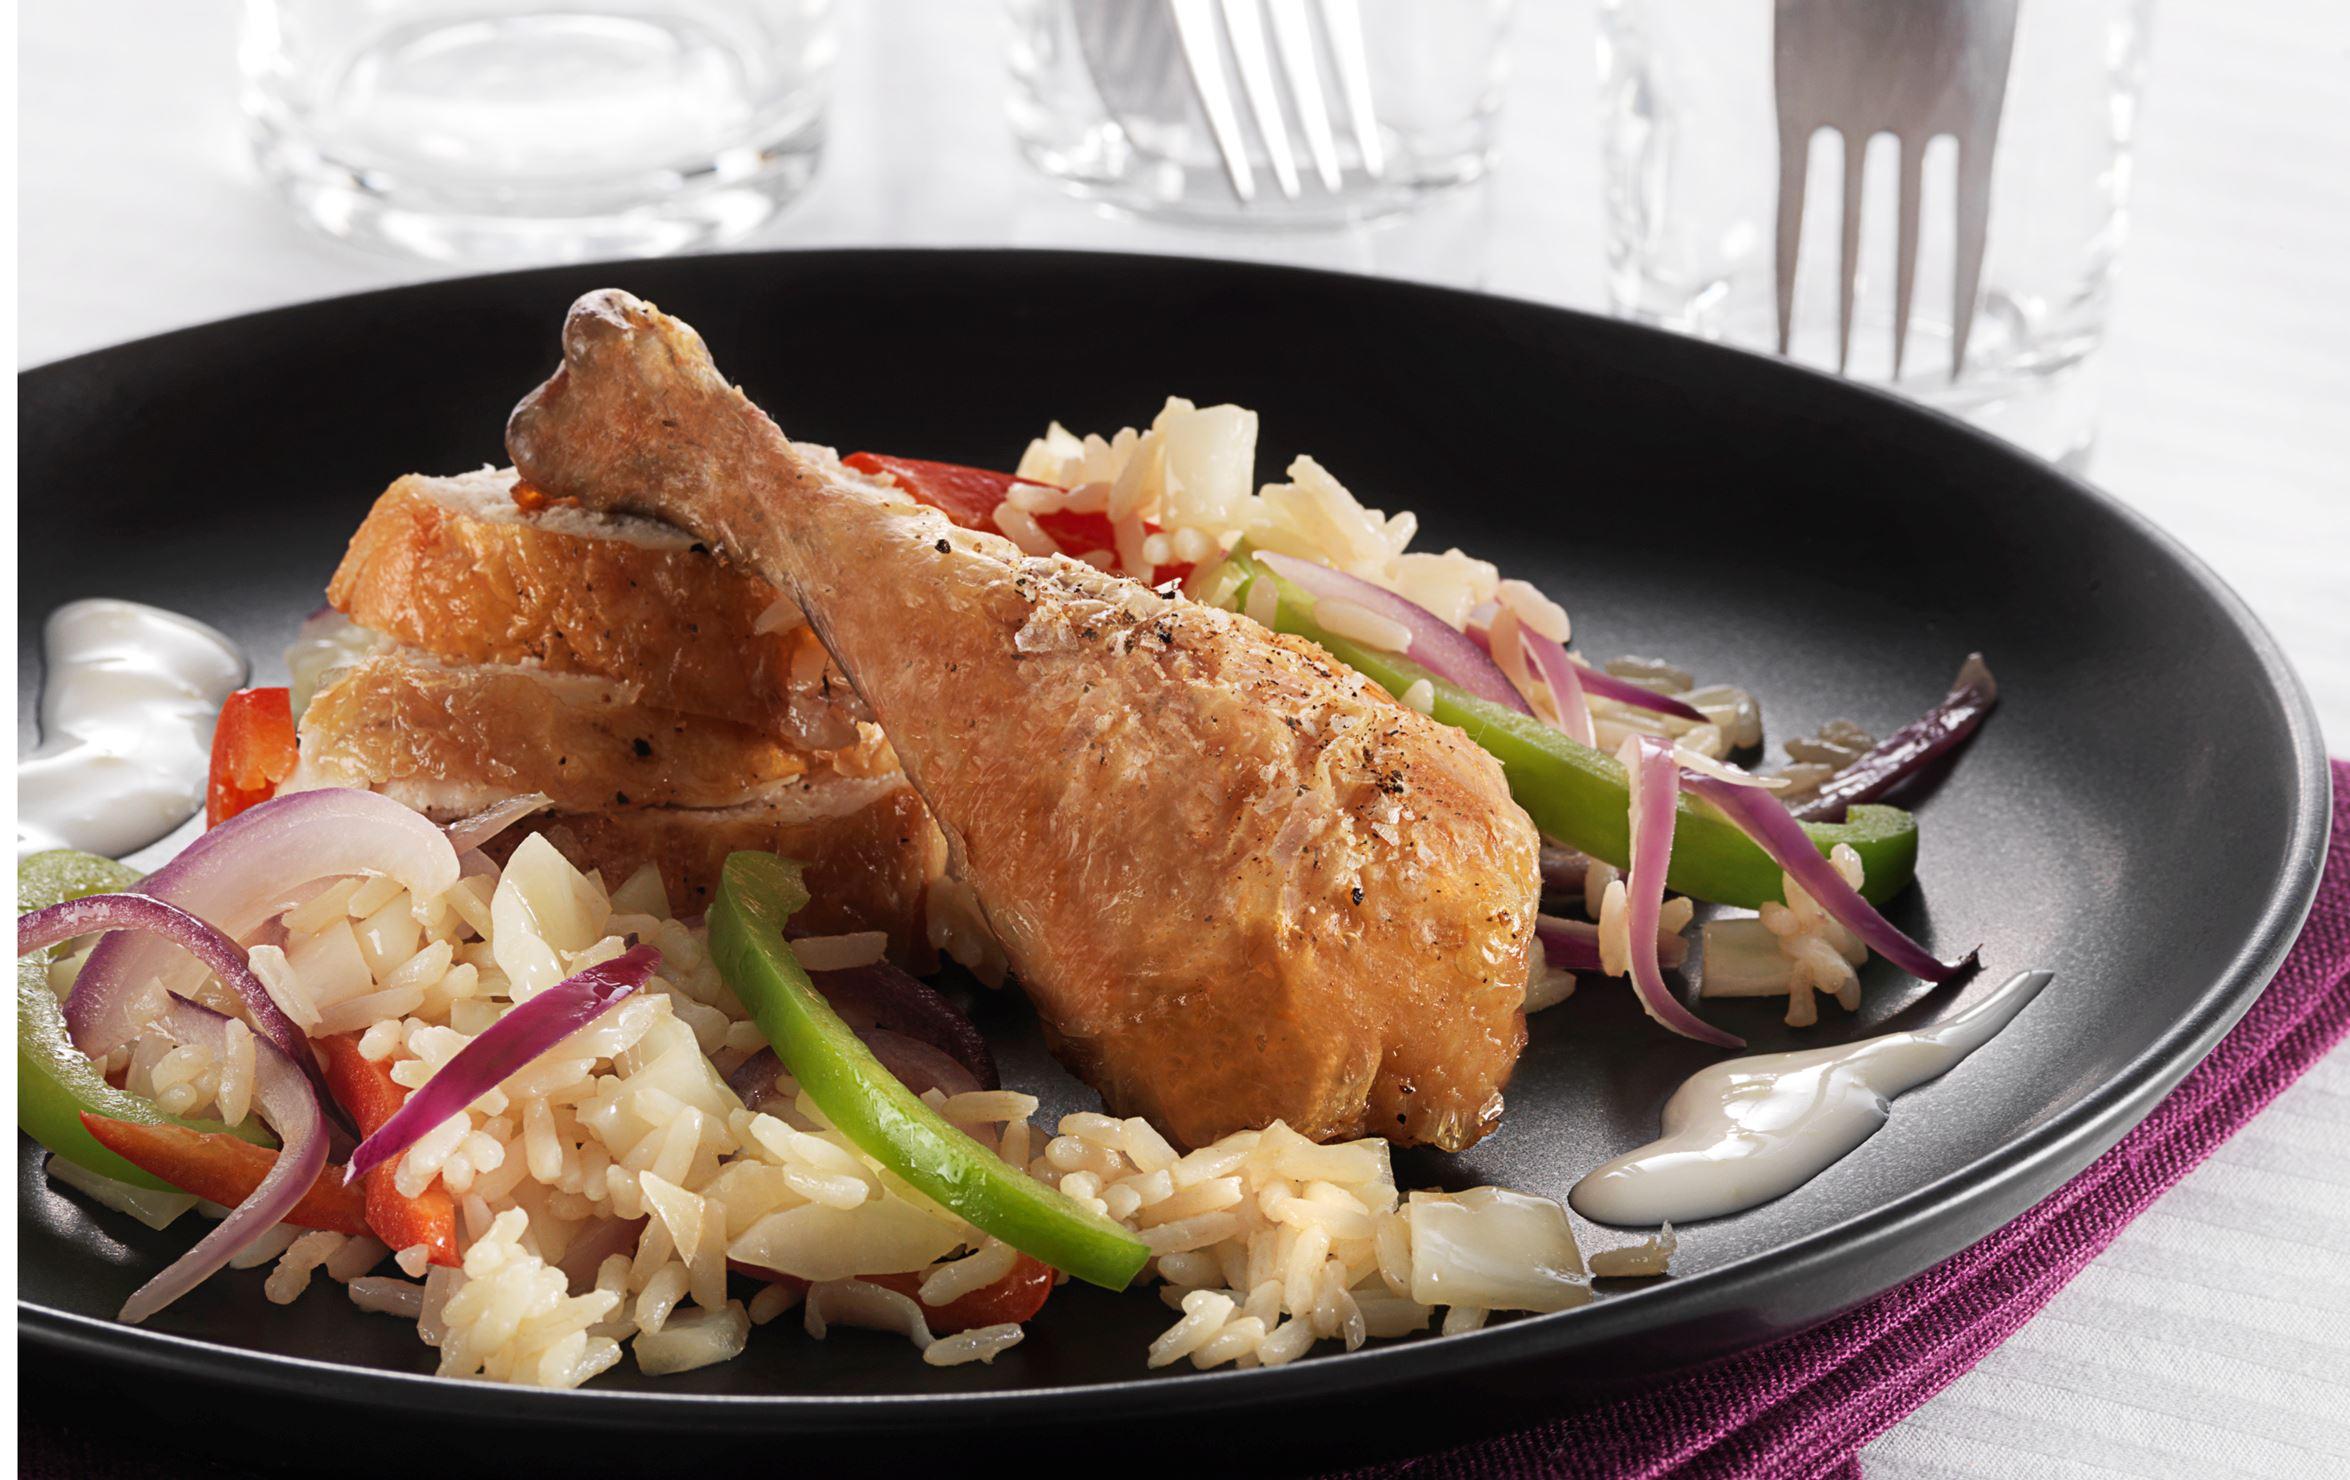 Sprødstegt kylling med grøntsagsris